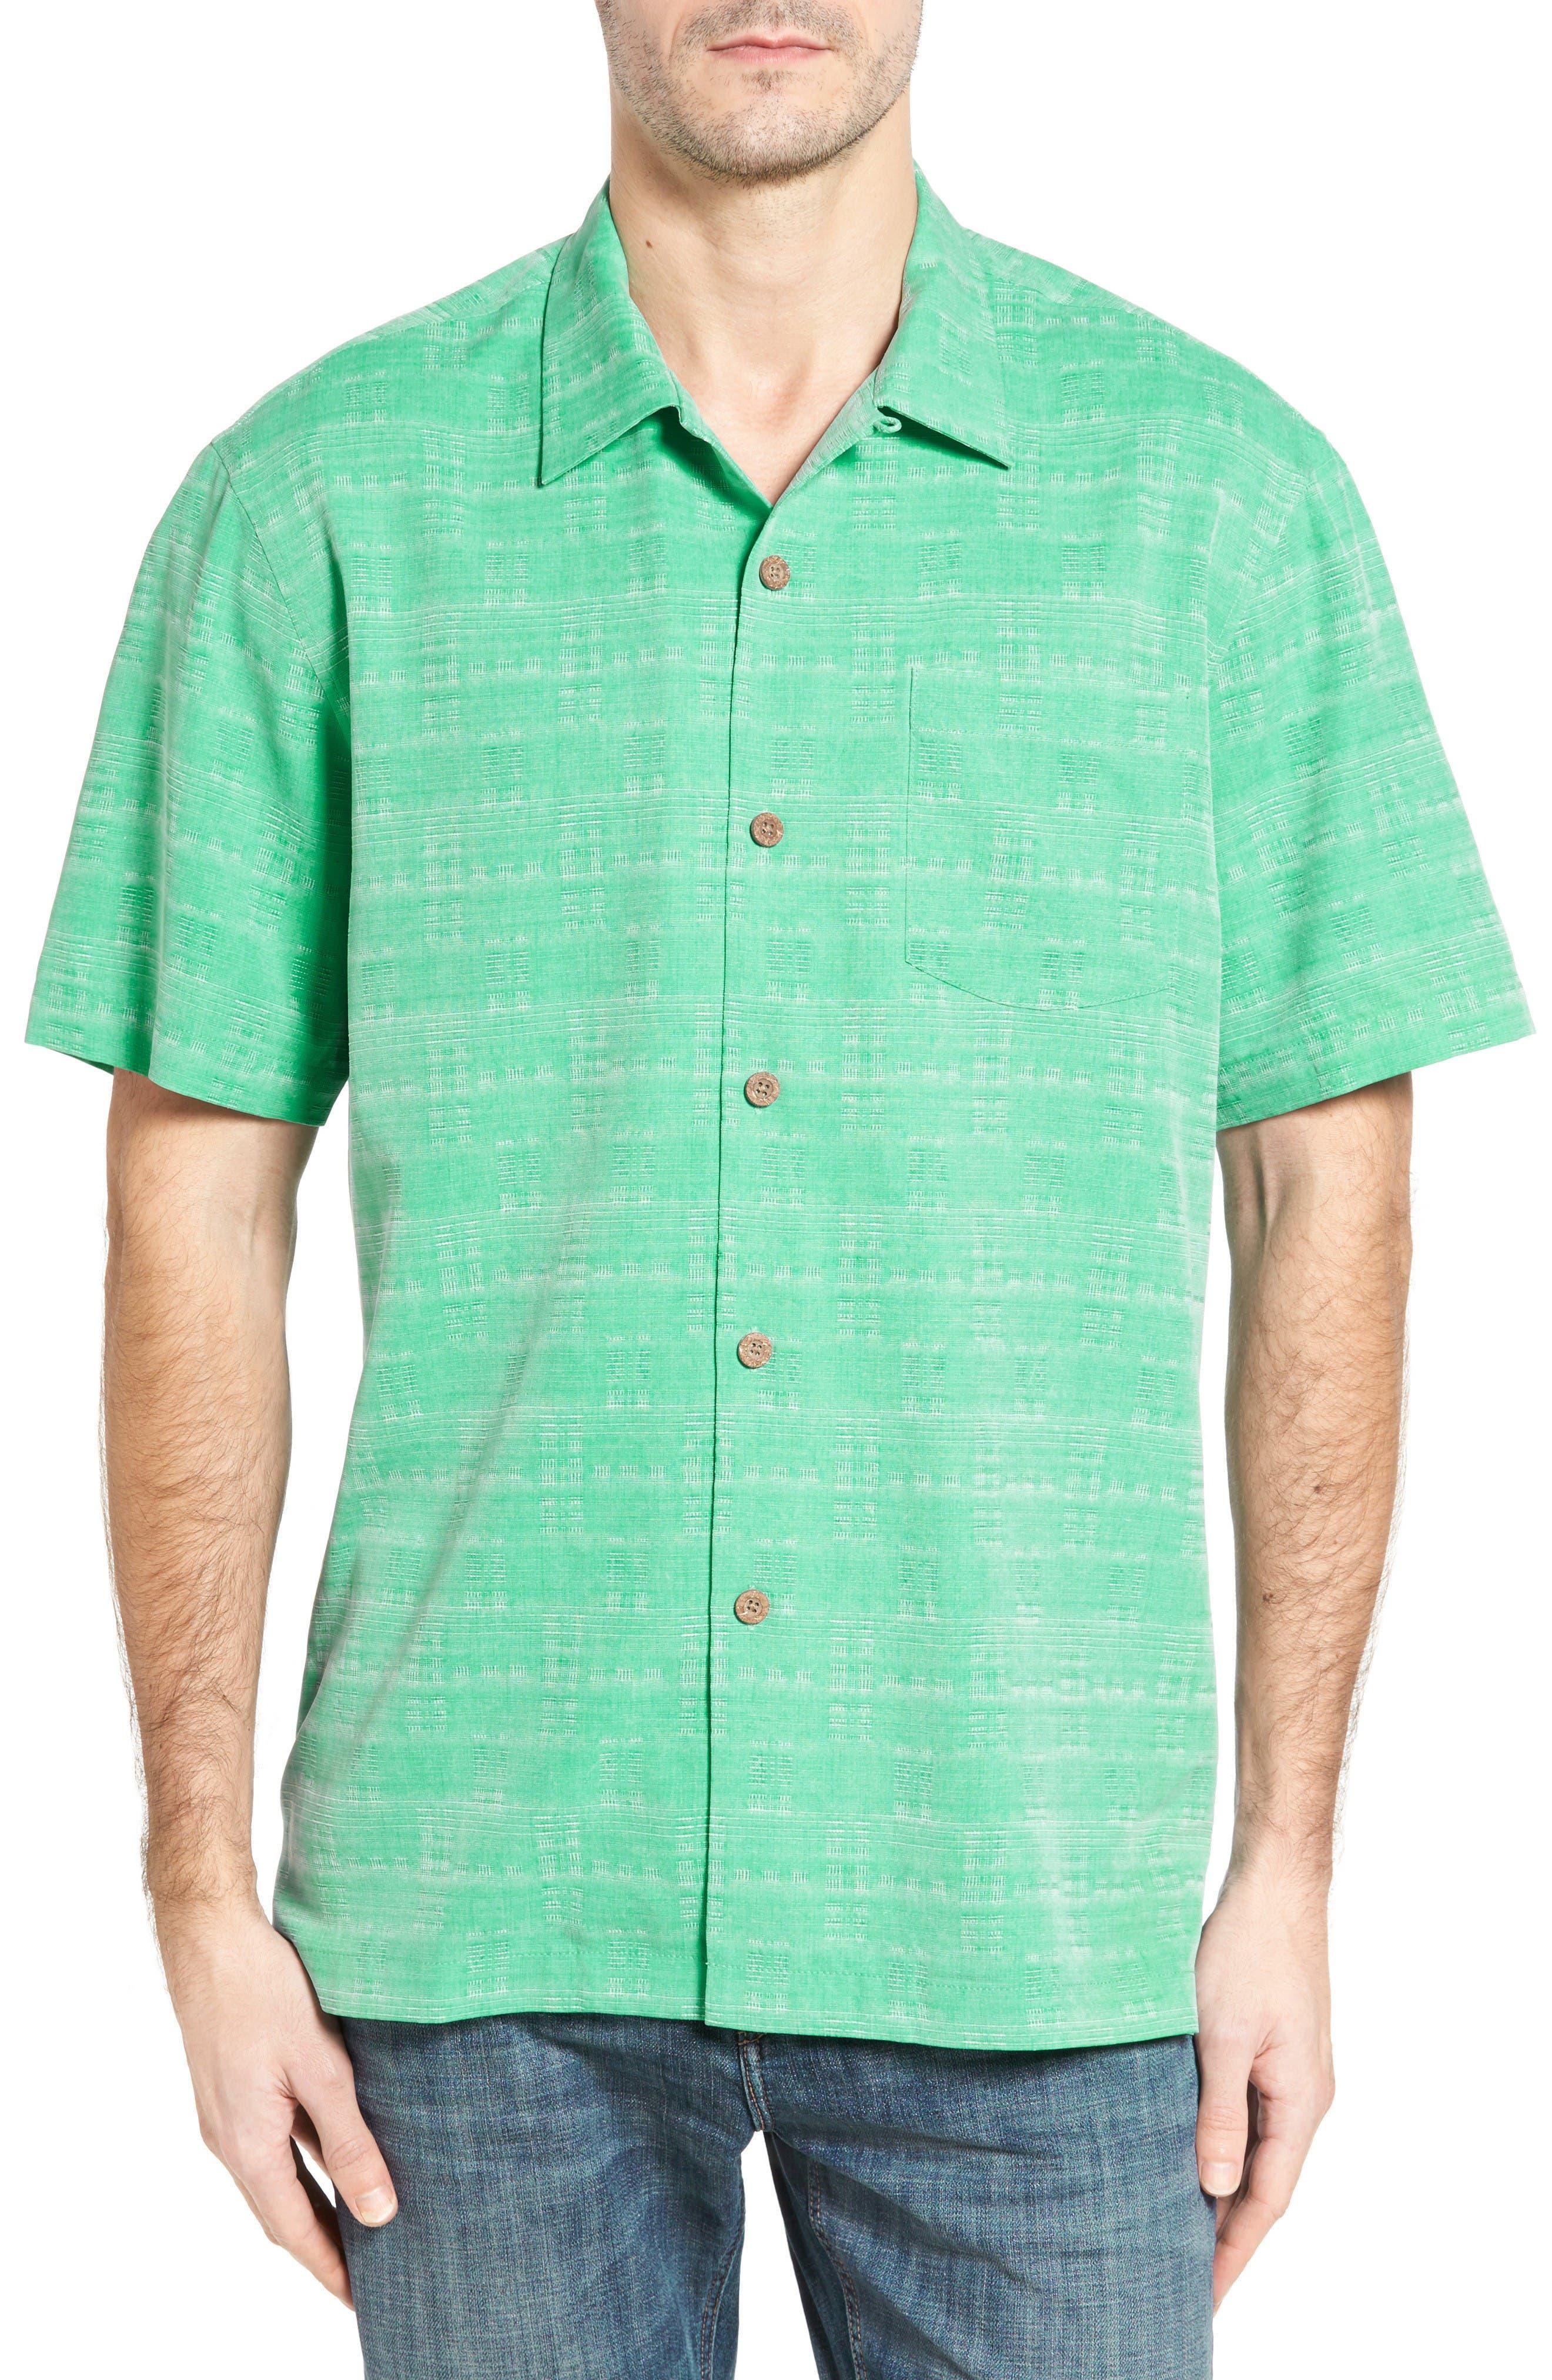 Tommy Bahama Original Fit Jacquard Silk Camp Shirt (Big & Tall)